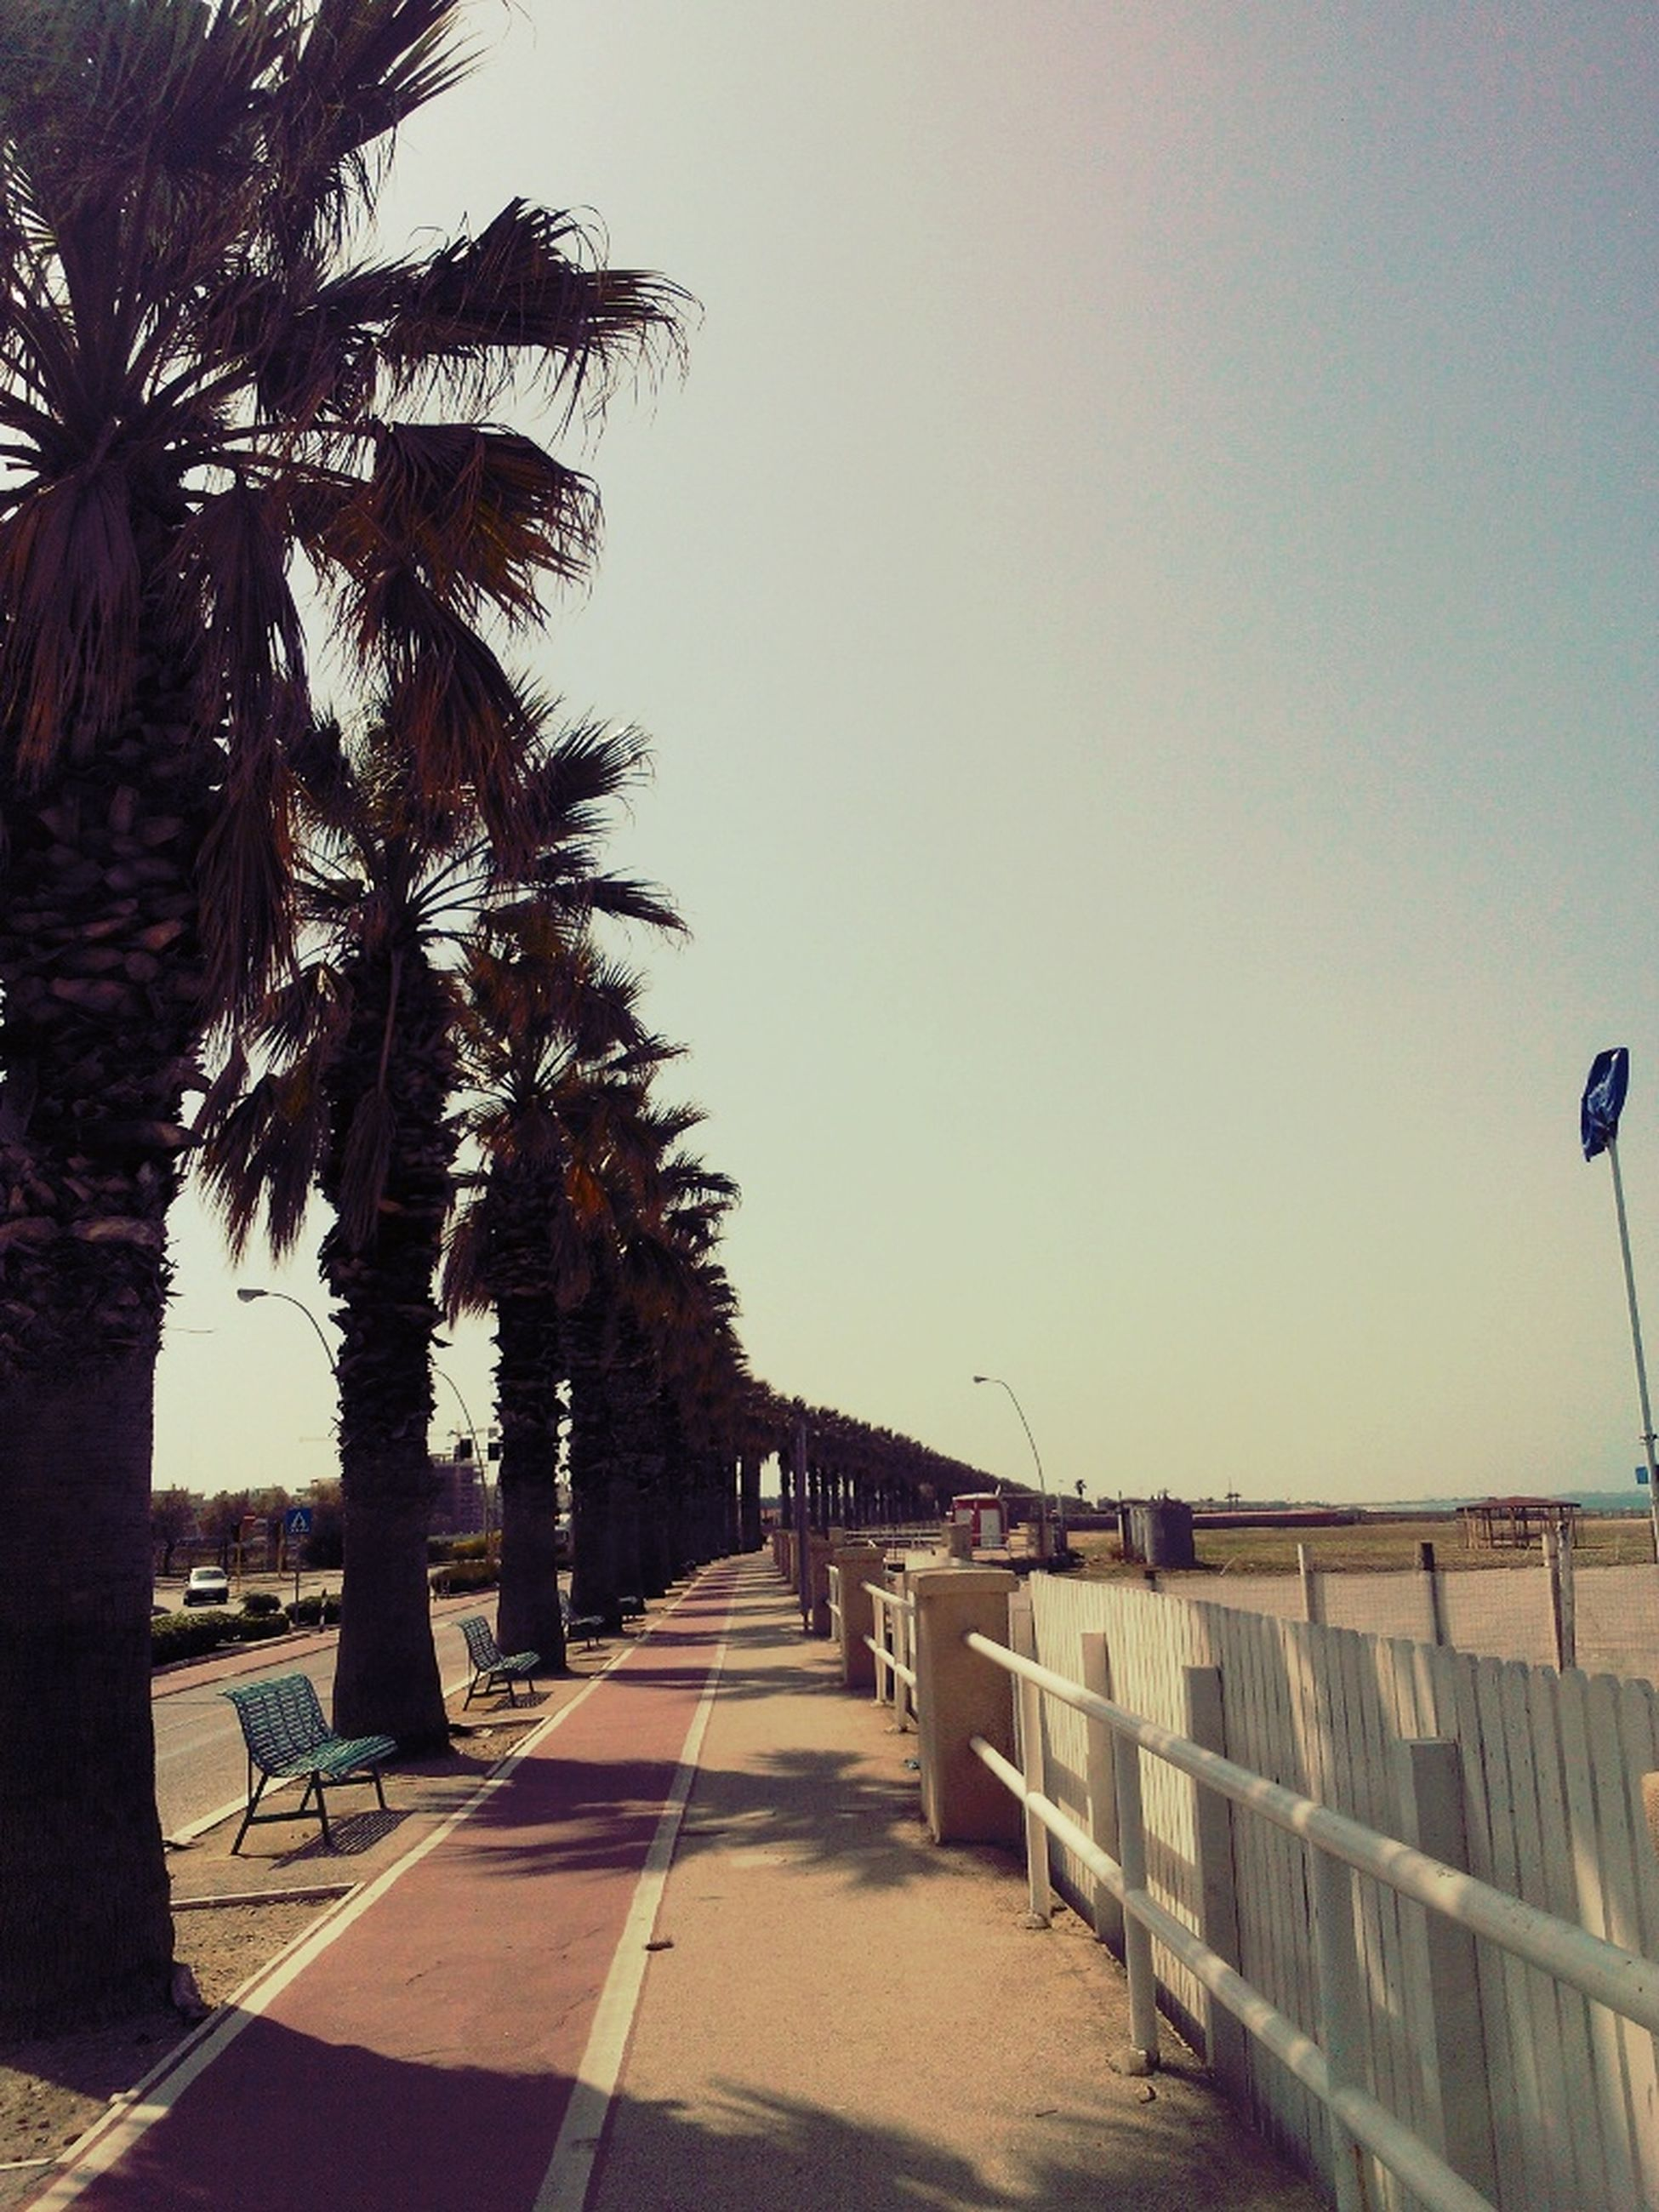 Sun And Beach = Happiness